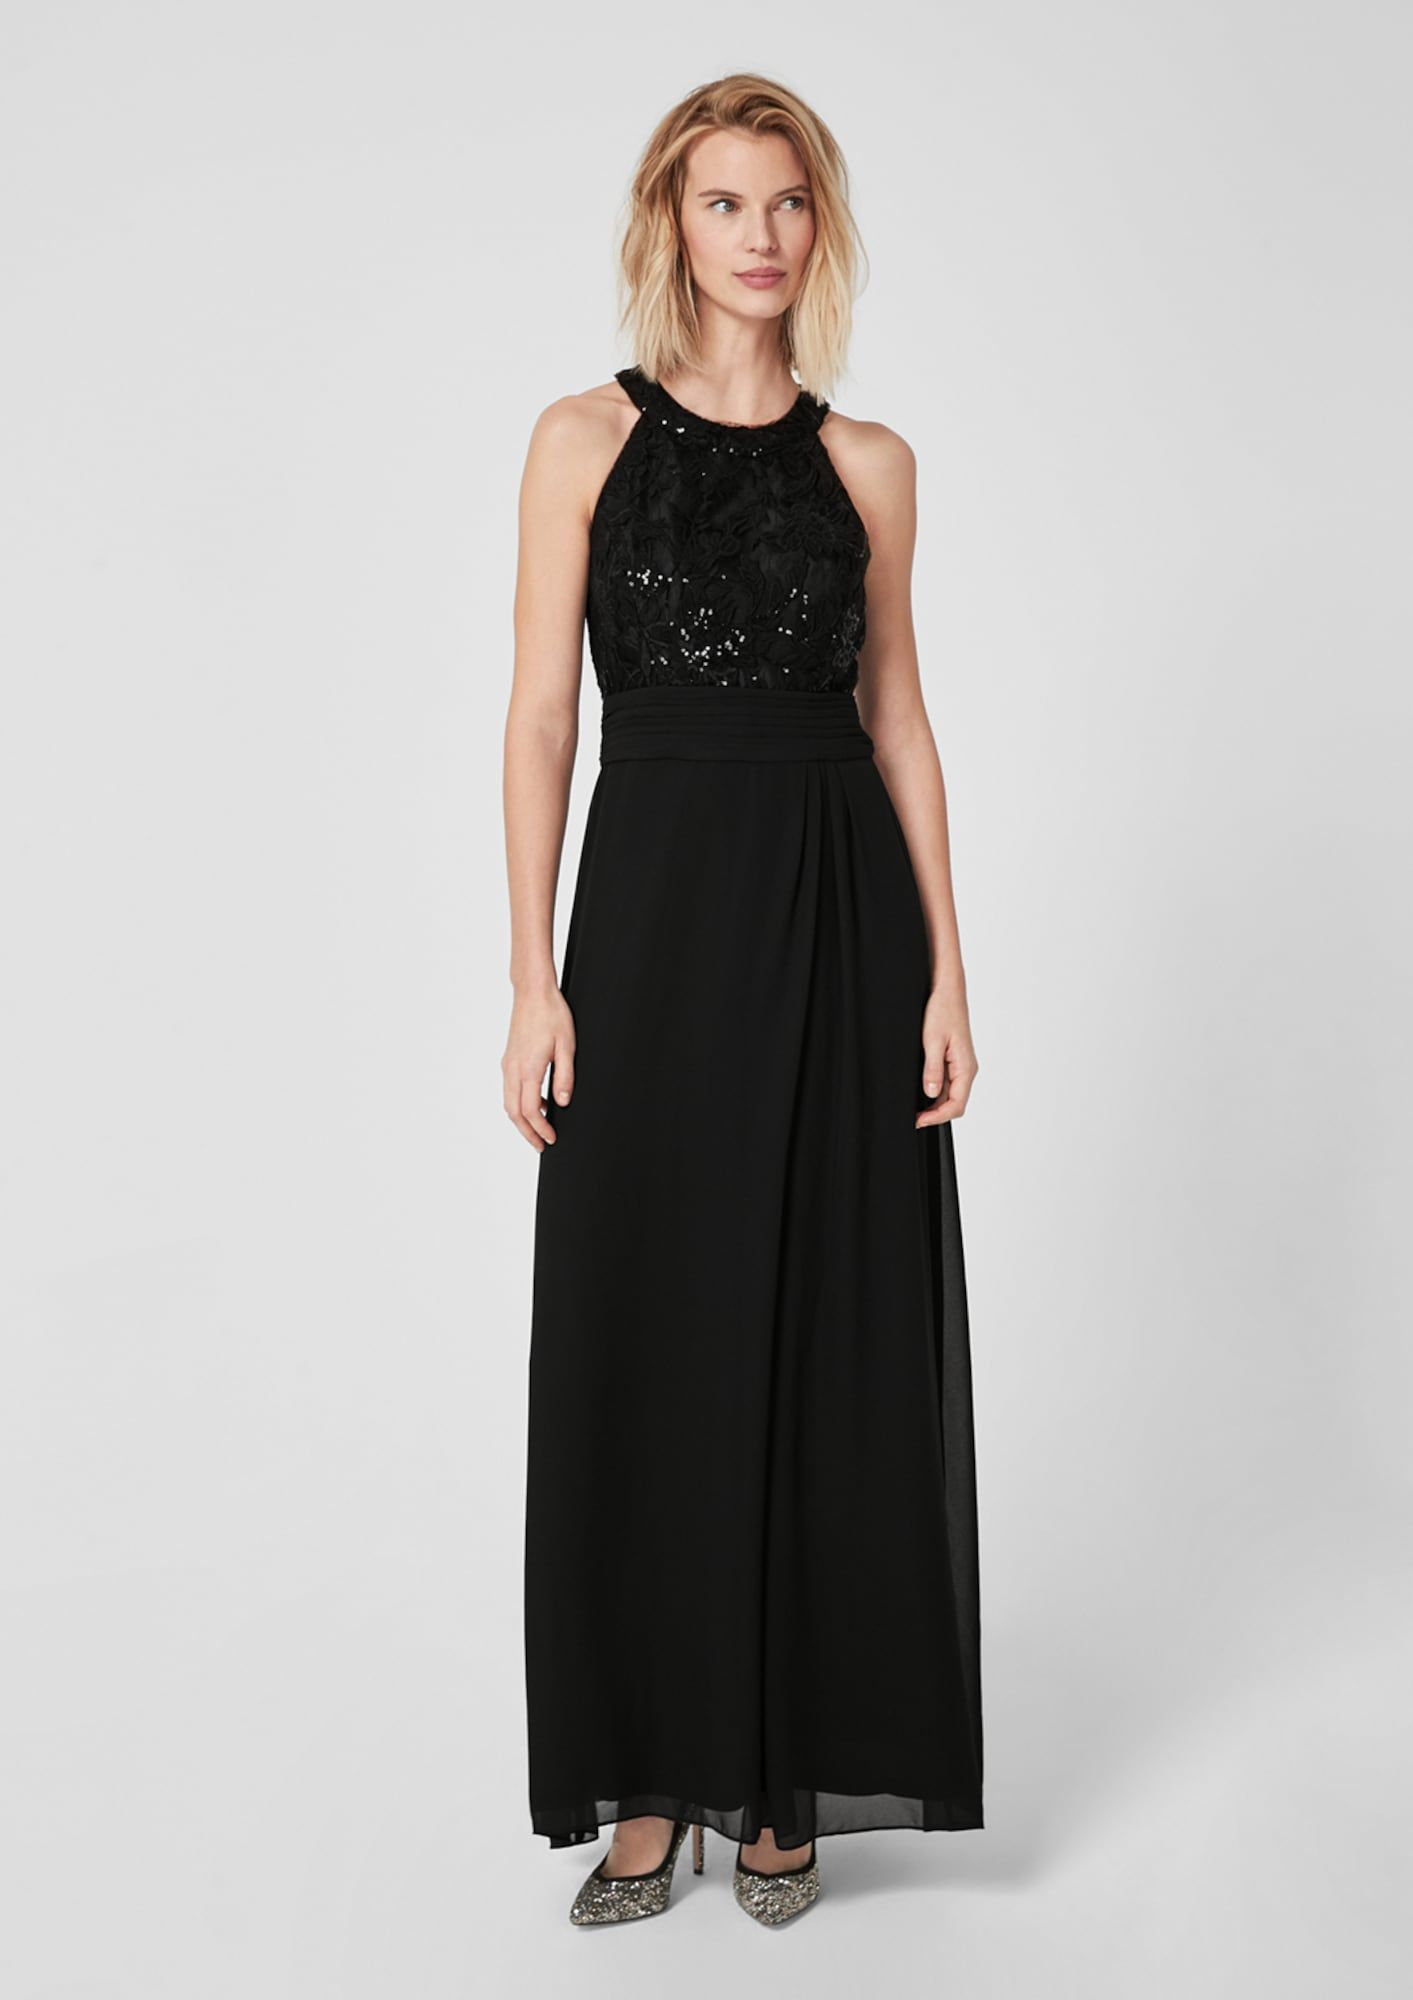 S.Oliver BLACK LABEL Abendkleid Damen, Schwarz, Größe 16